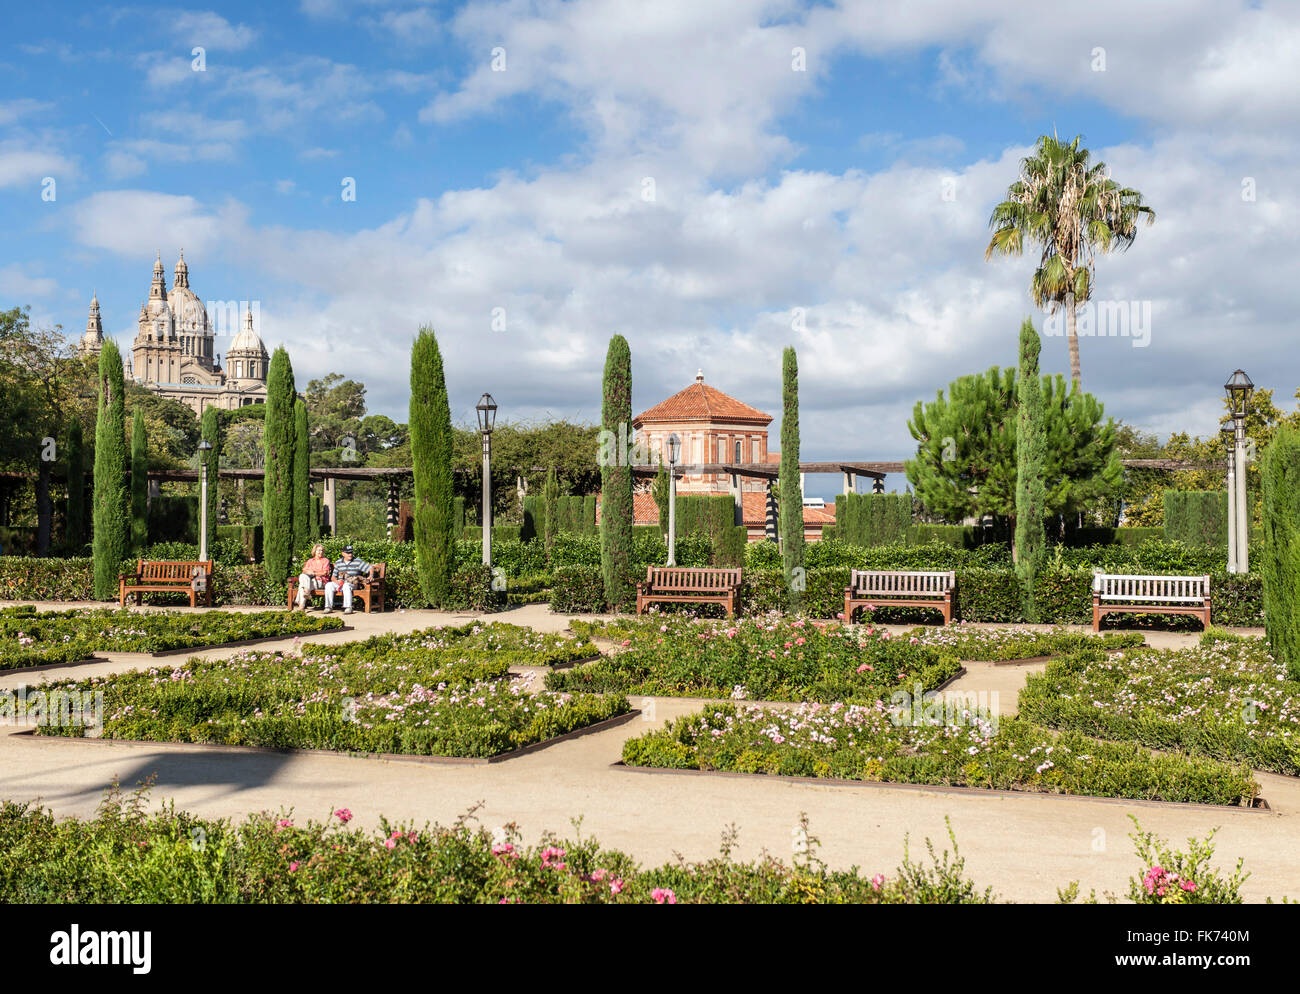 Gardens Teatre Grec, designed by Jean-Claude-Nicolas Forestier , Montjuic, Barcelona. - Stock Image